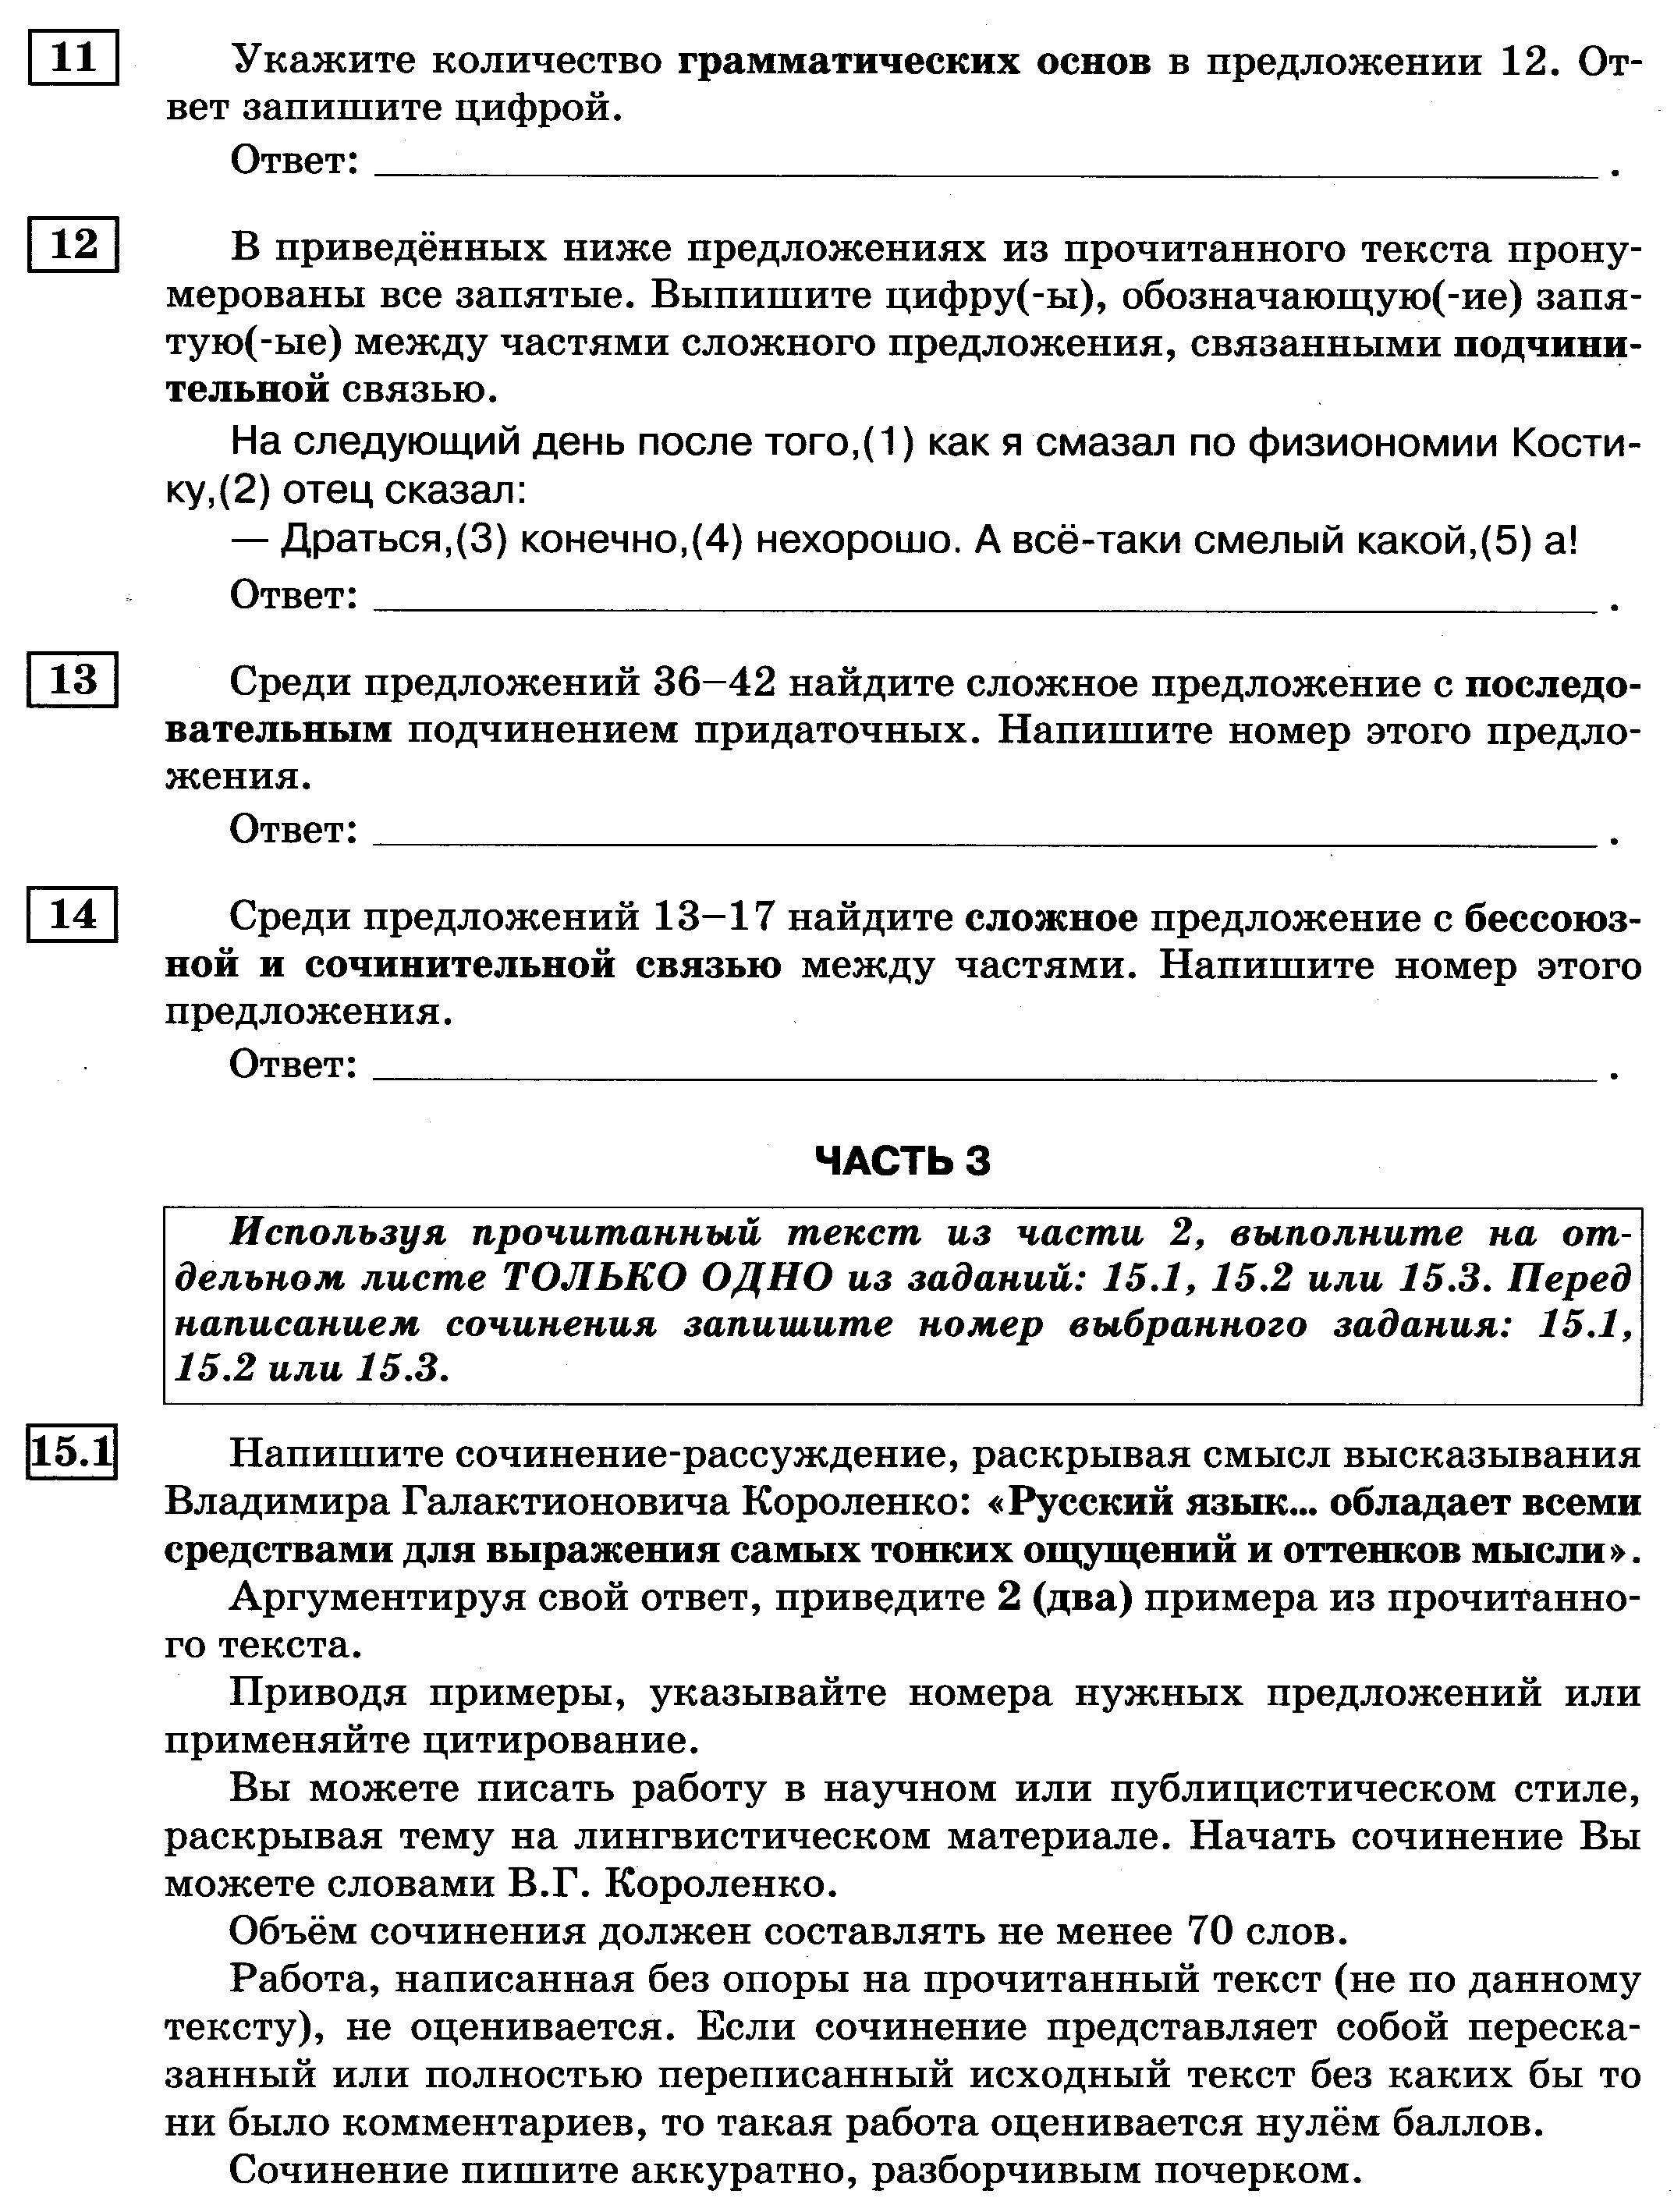 C:\Documents and Settings\Наташа\Рабочий стол\ОГЭ 2016\КИМы Степановой ОГЭ-2016\img292.jpg